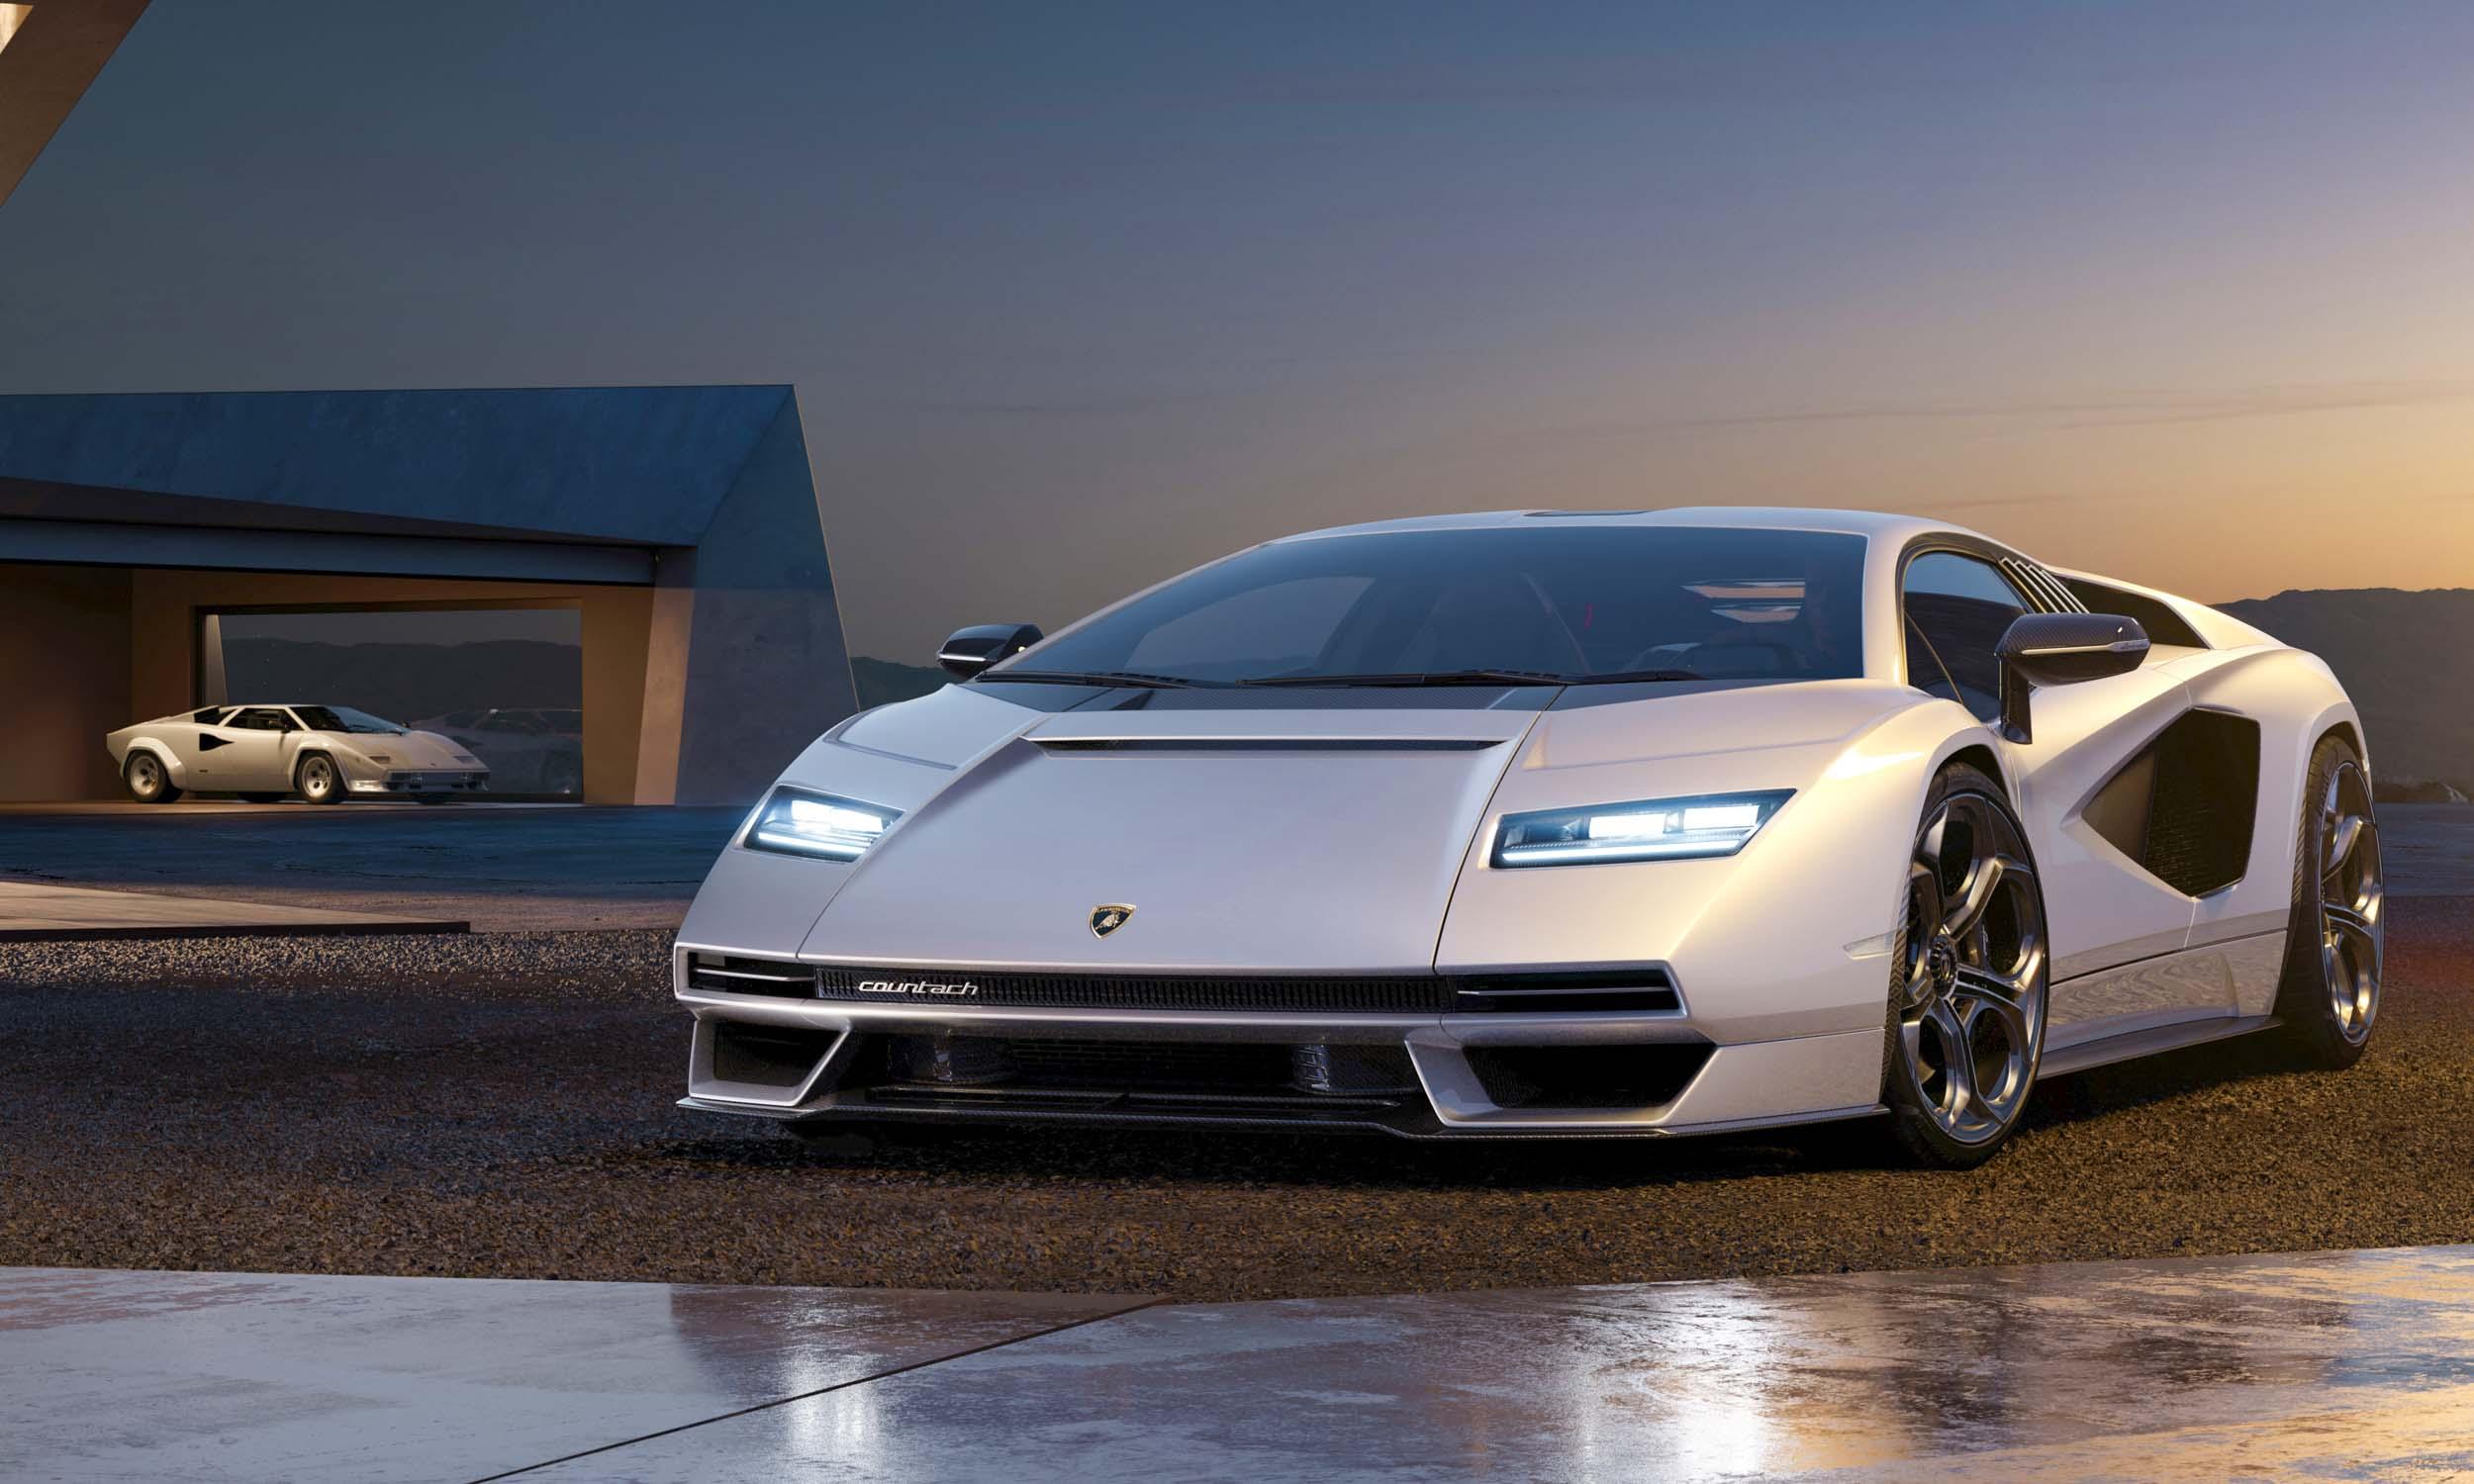 In Photos: Return of the Legendary Lamborghini Countach